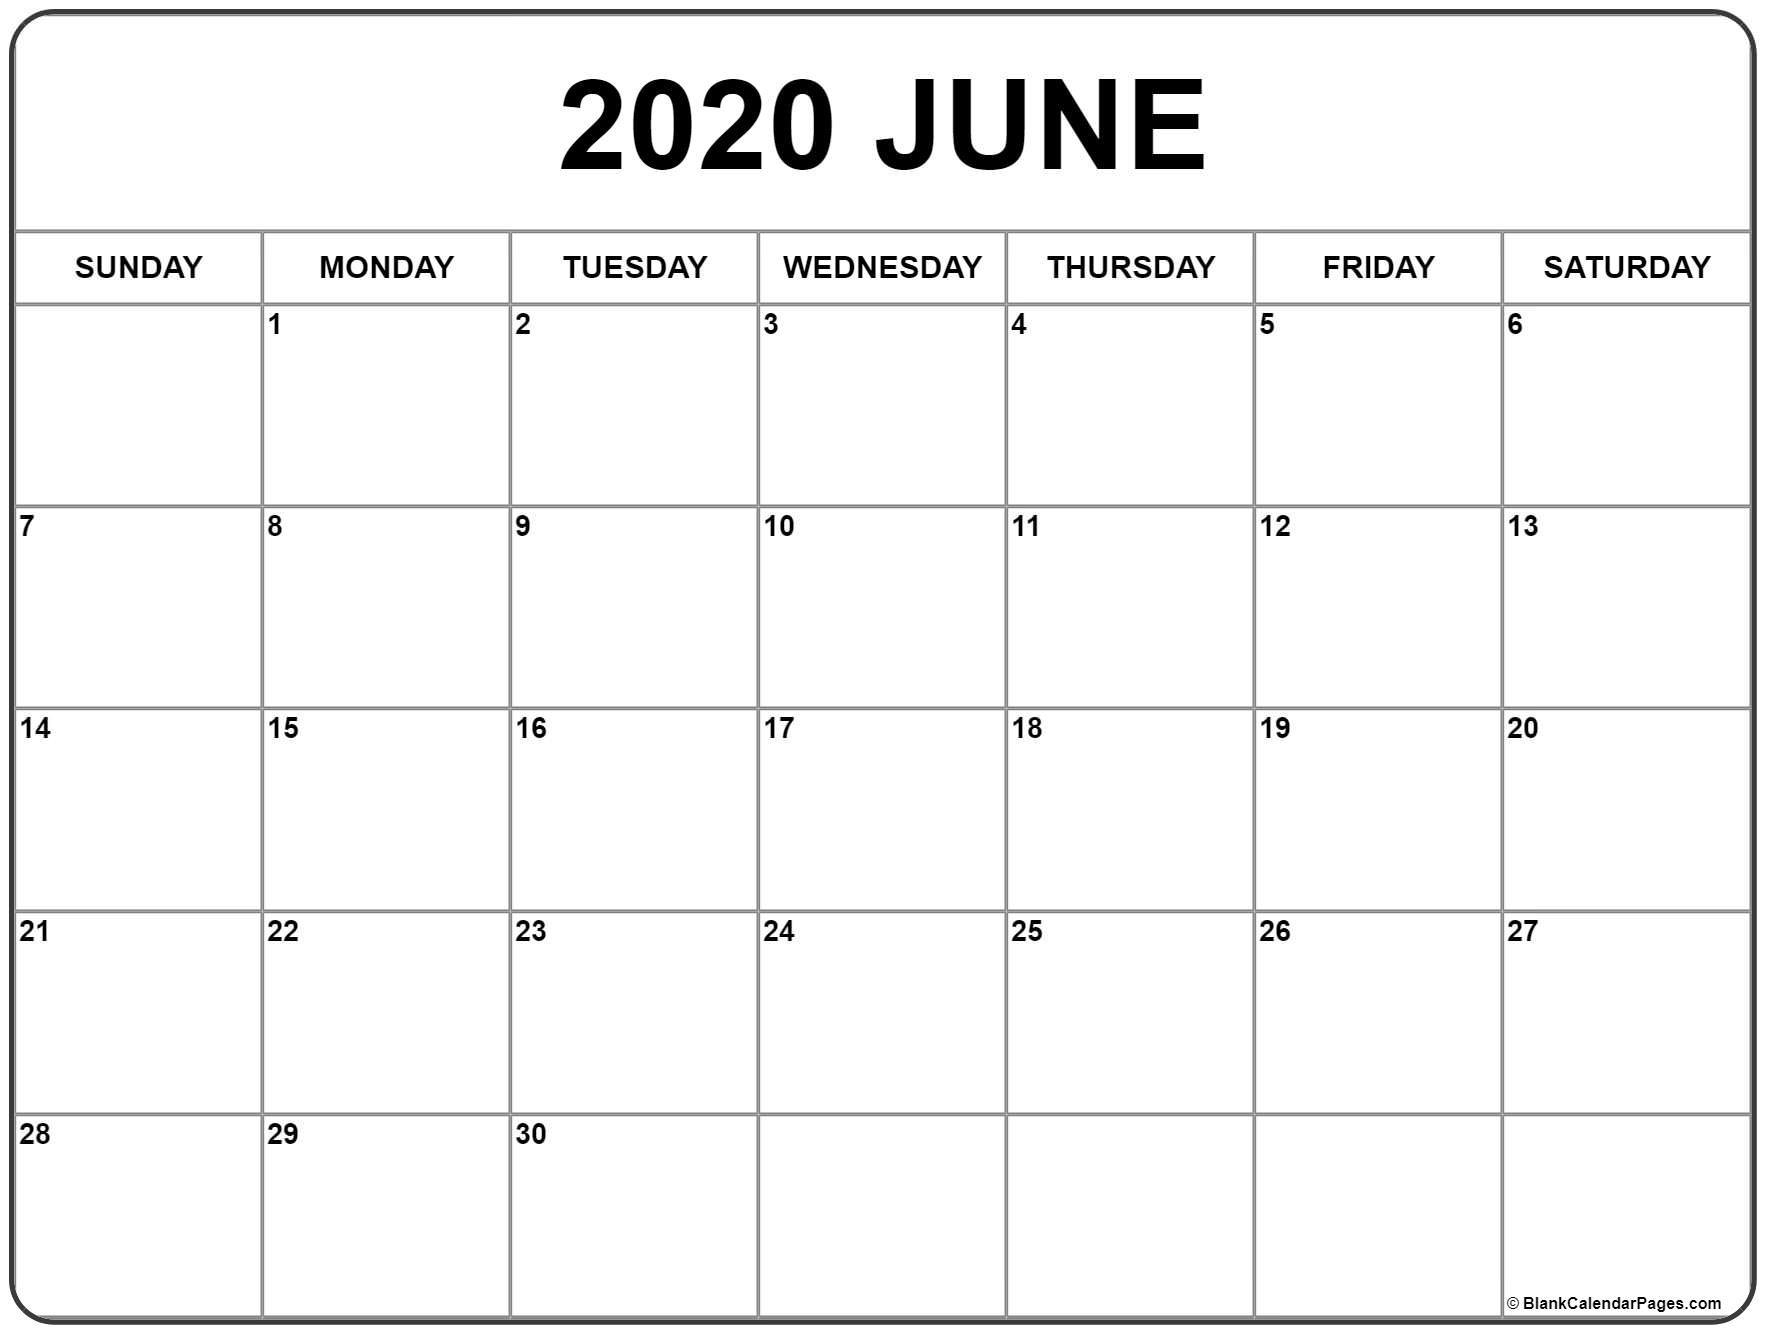 June 2020 Calendar | Free Printable Monthly Calendars-Blank Printable Calendar 2020 Monthly